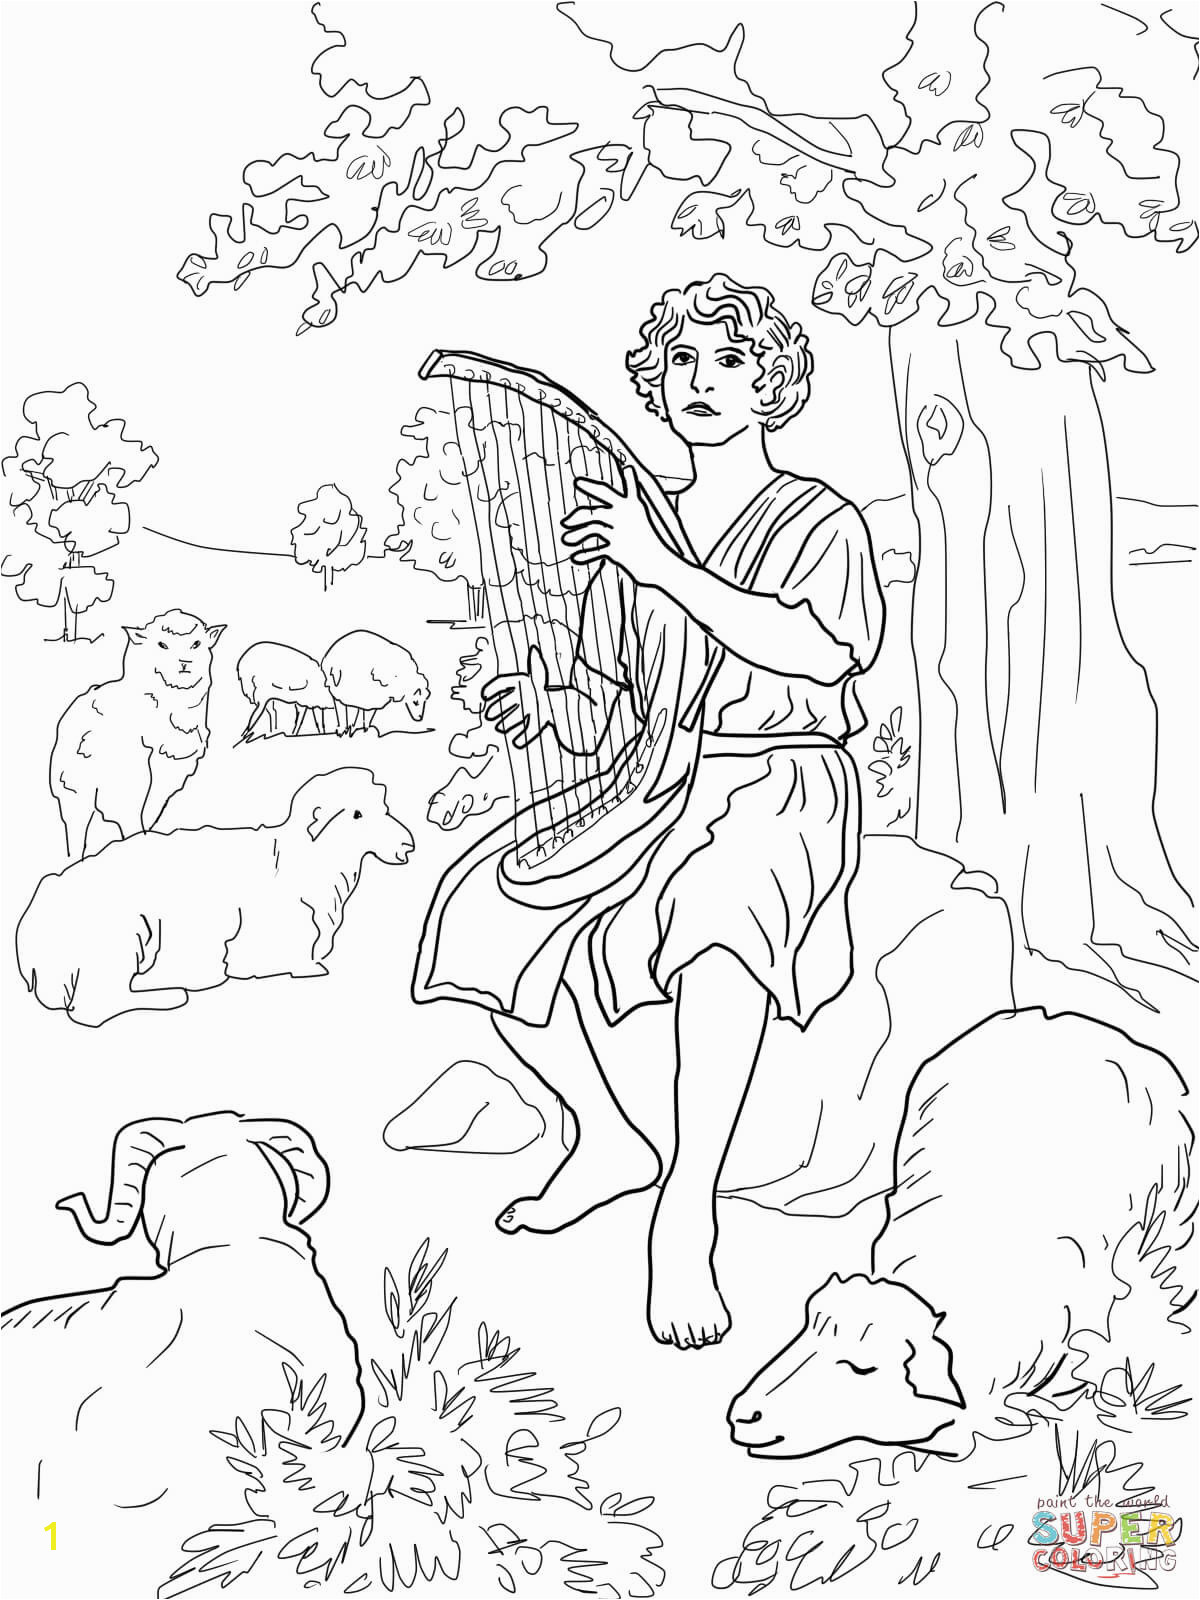 King David Coloring Pages King David Coloring Pages